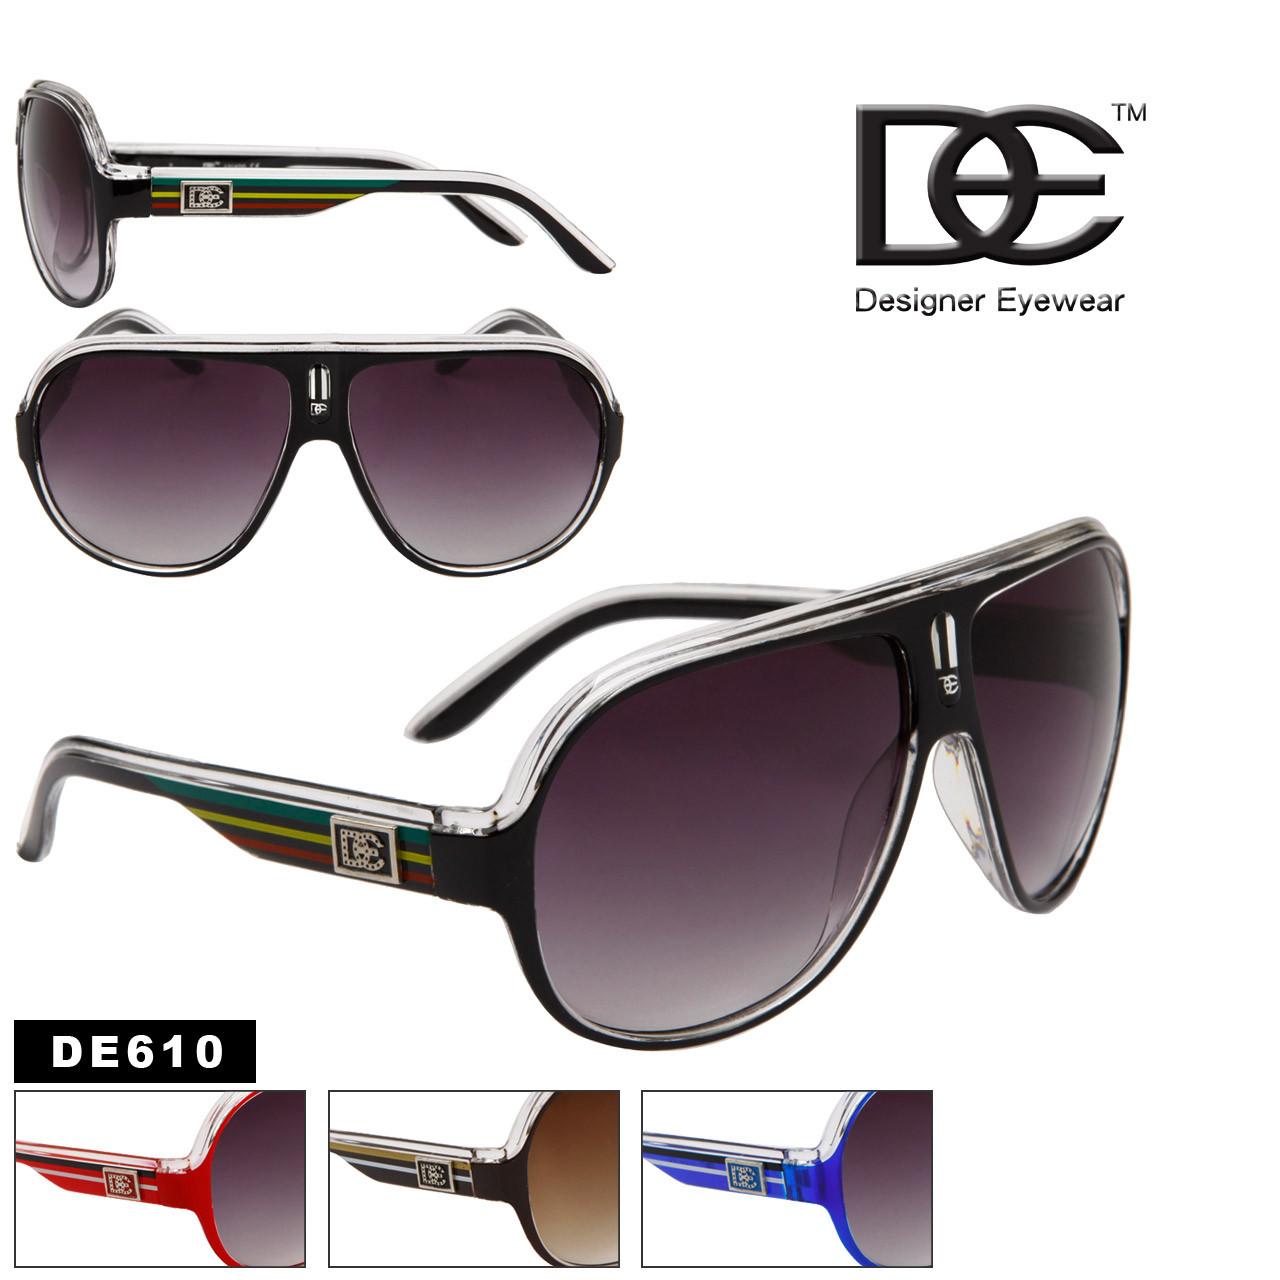 DE™ Designer Eyewear Wholesale Stunners - Style # DE610